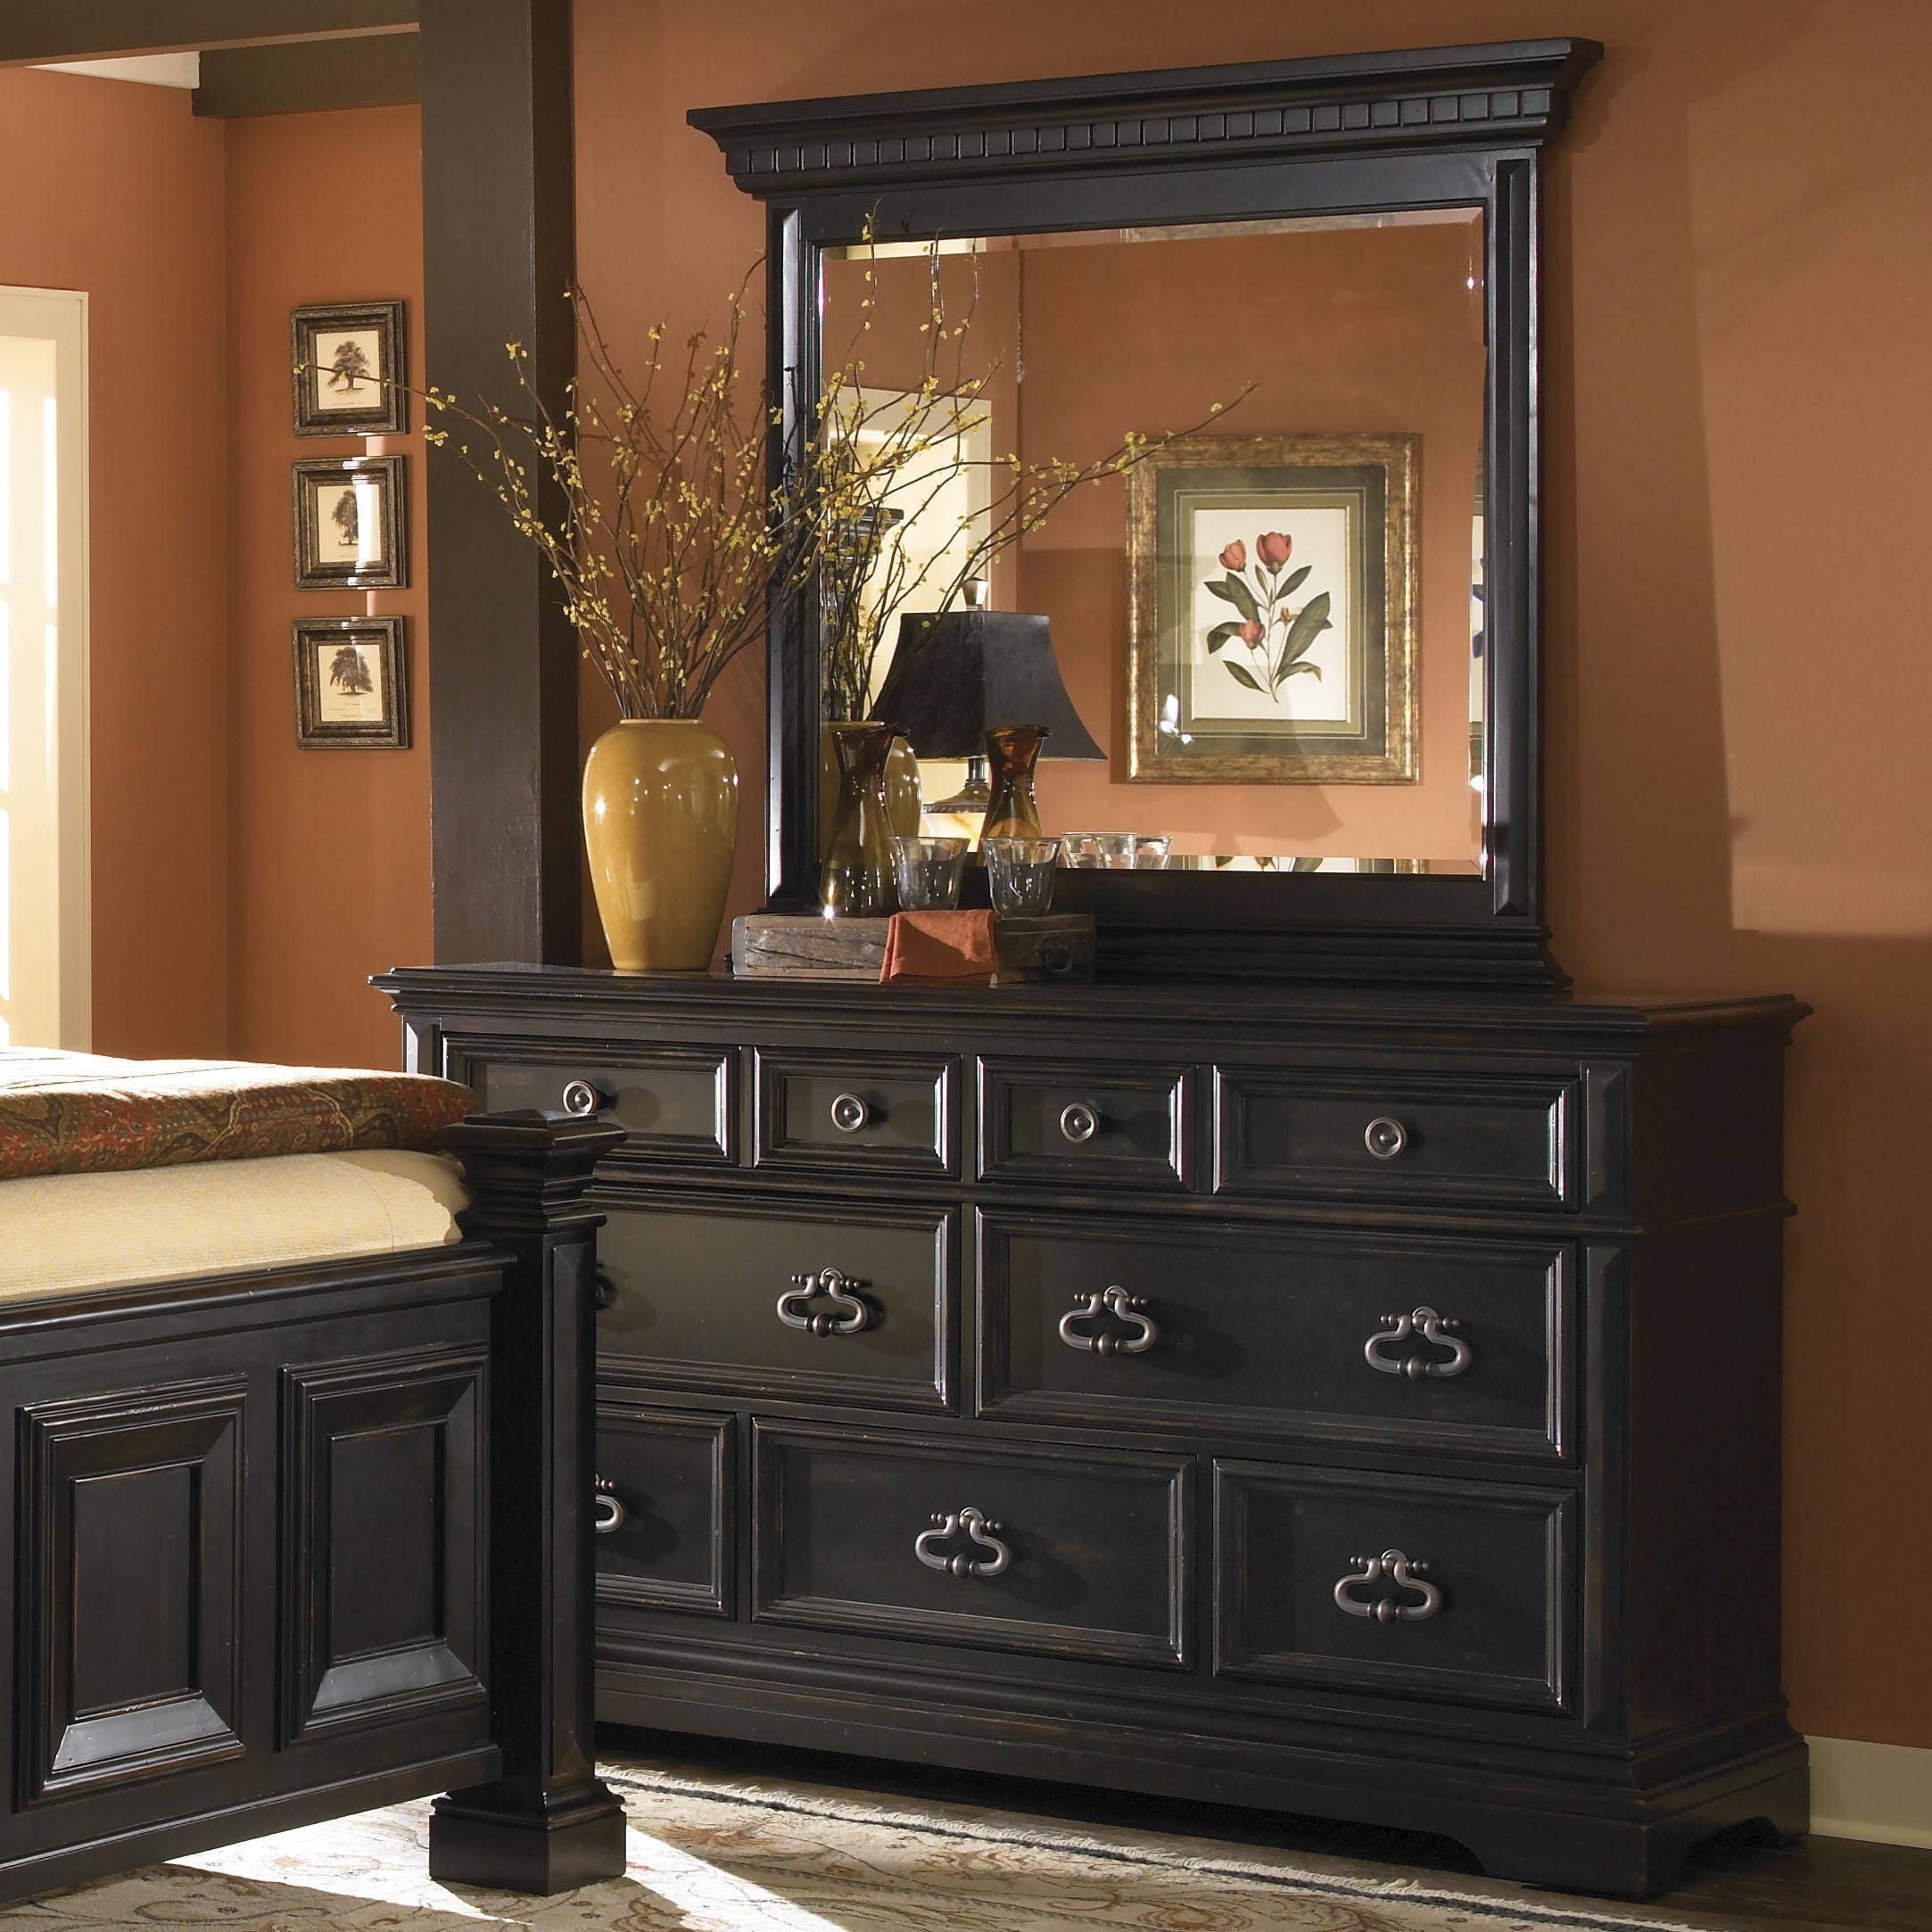 Superbe Pulaski Furniture Brookfield Transitional Bedroom Dresser With Mirror